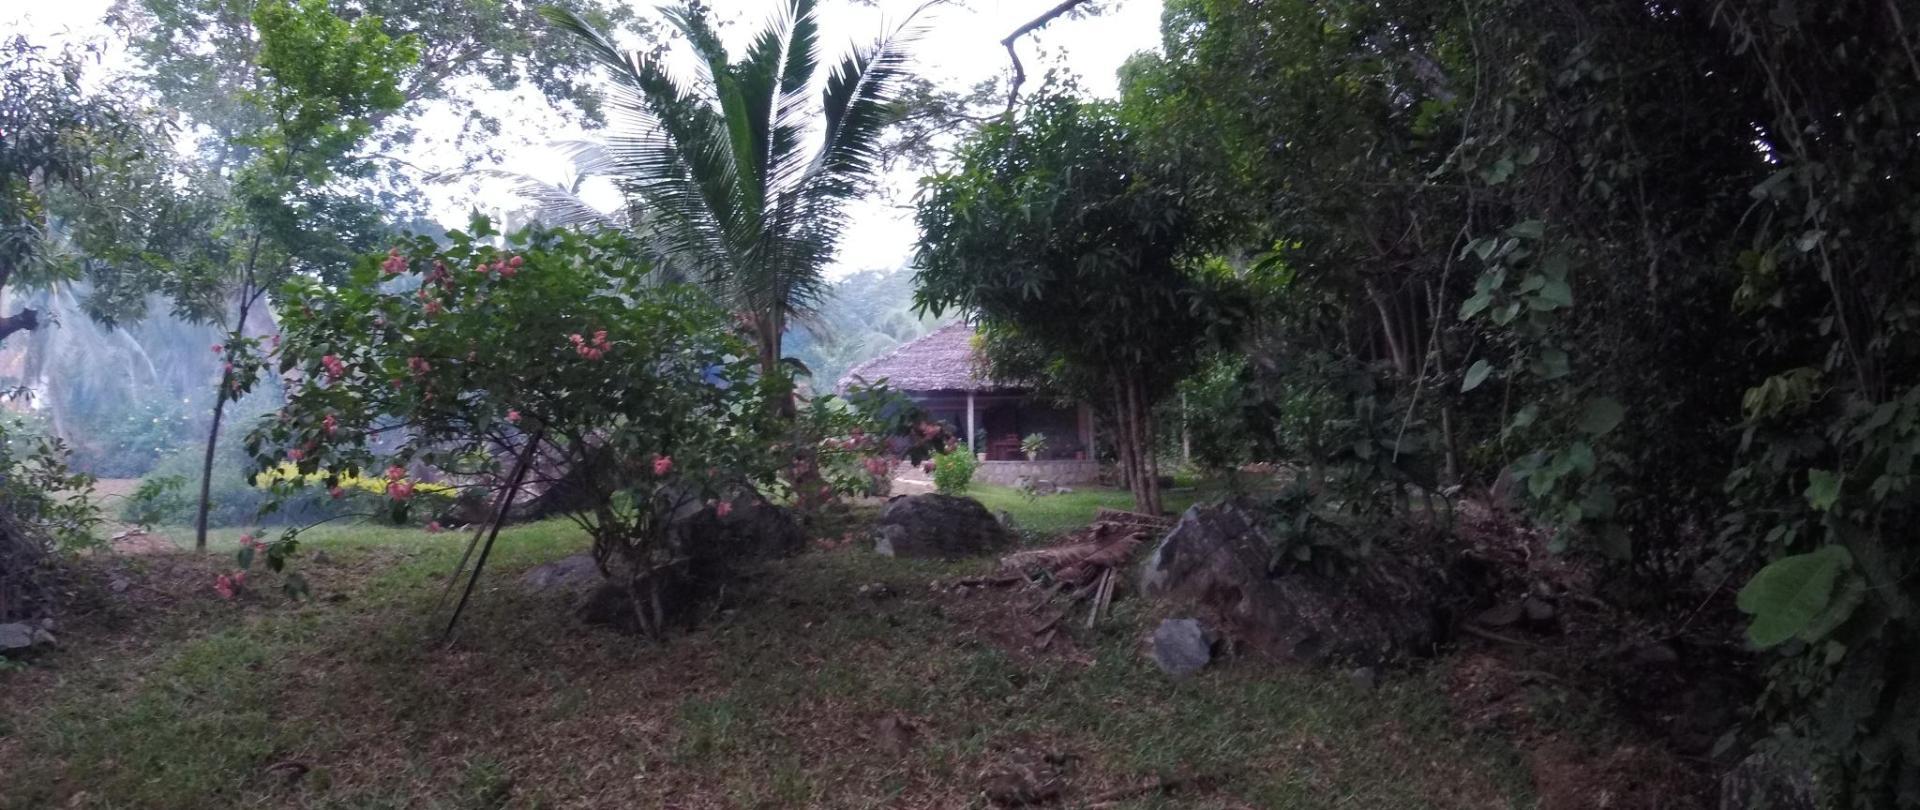 Les Jardins d'Ankify